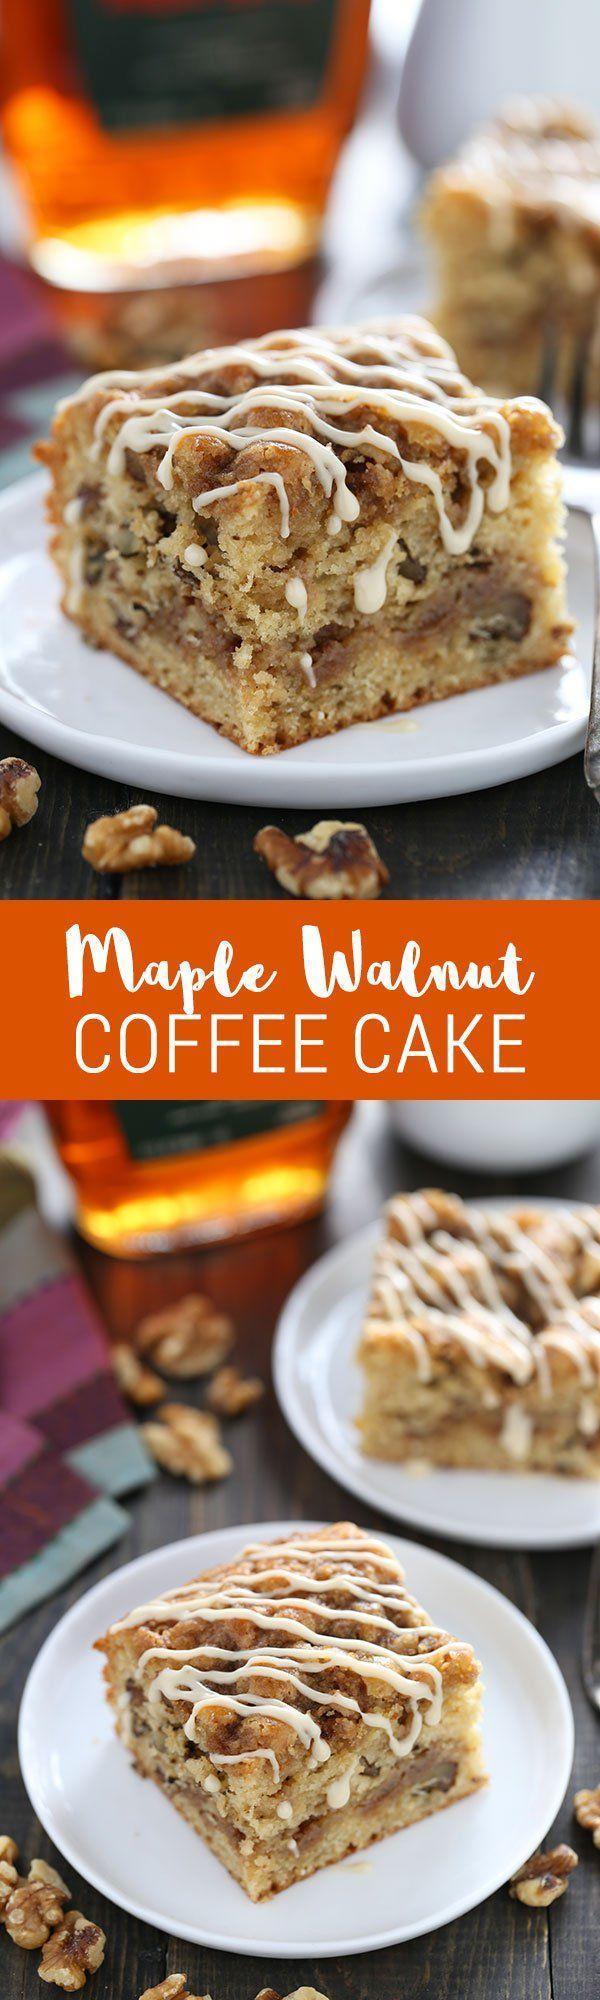 Easy cinnamon bundt cake recipes